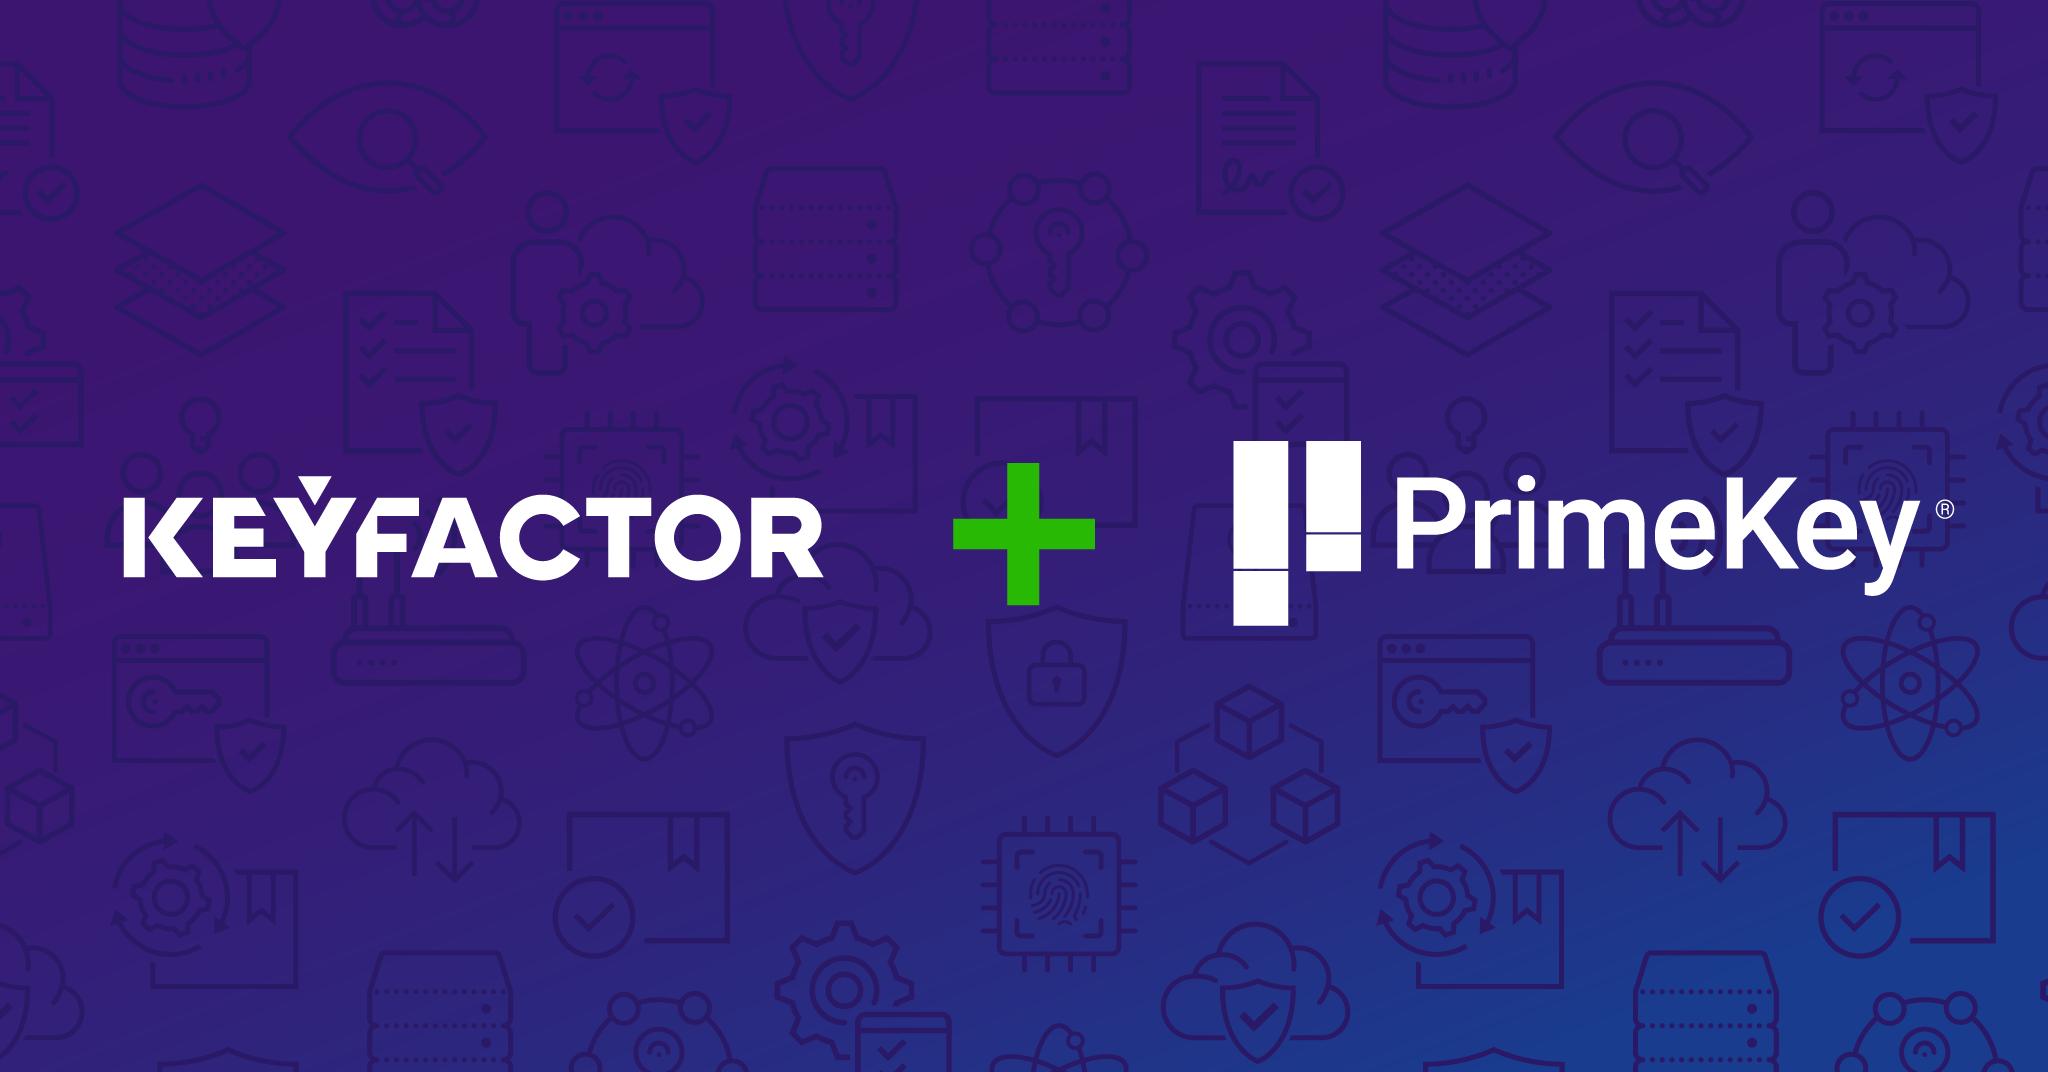 Keyfactor has completed merger with PrimeKey under the Keyfactor brand